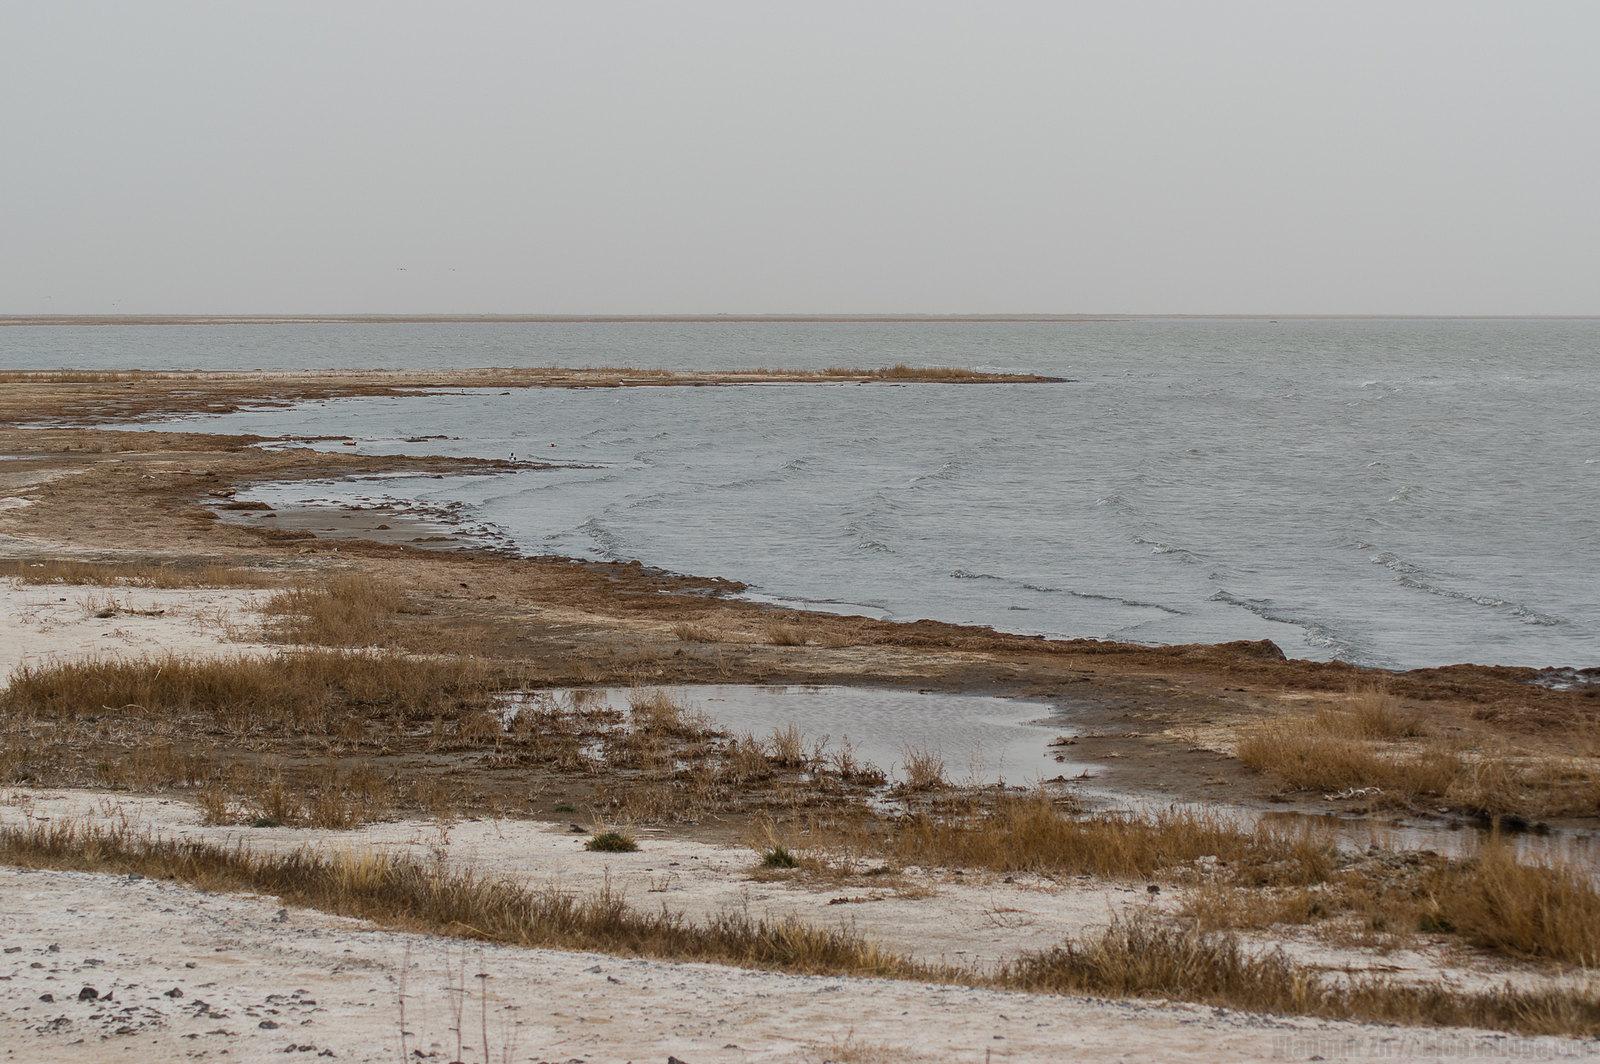 Dalinor Lake